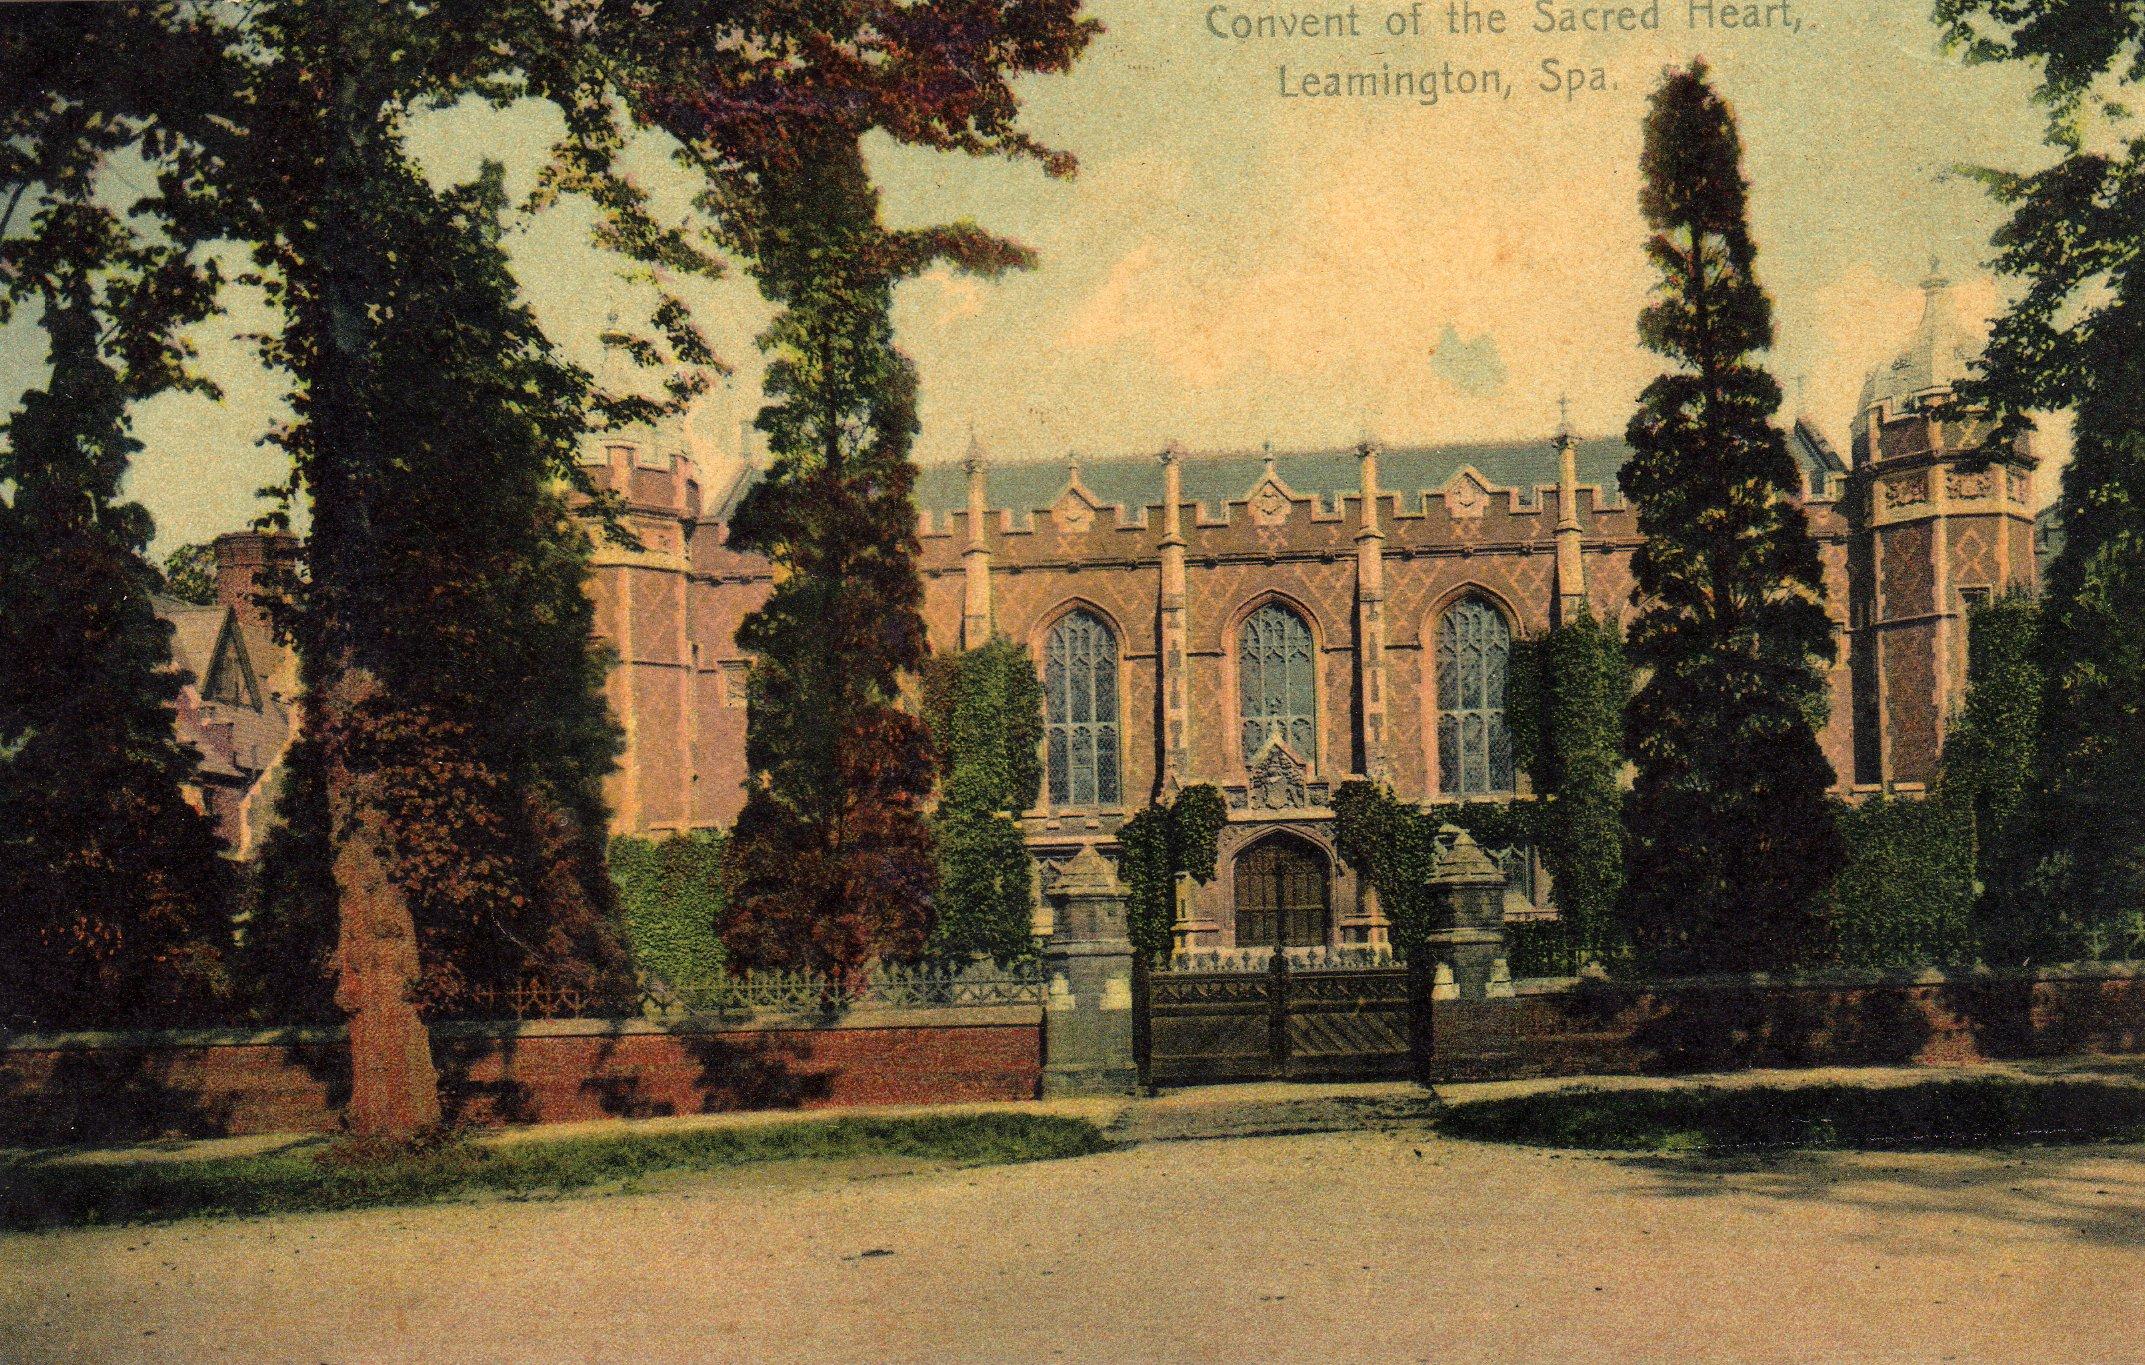 Convent/Leamington College